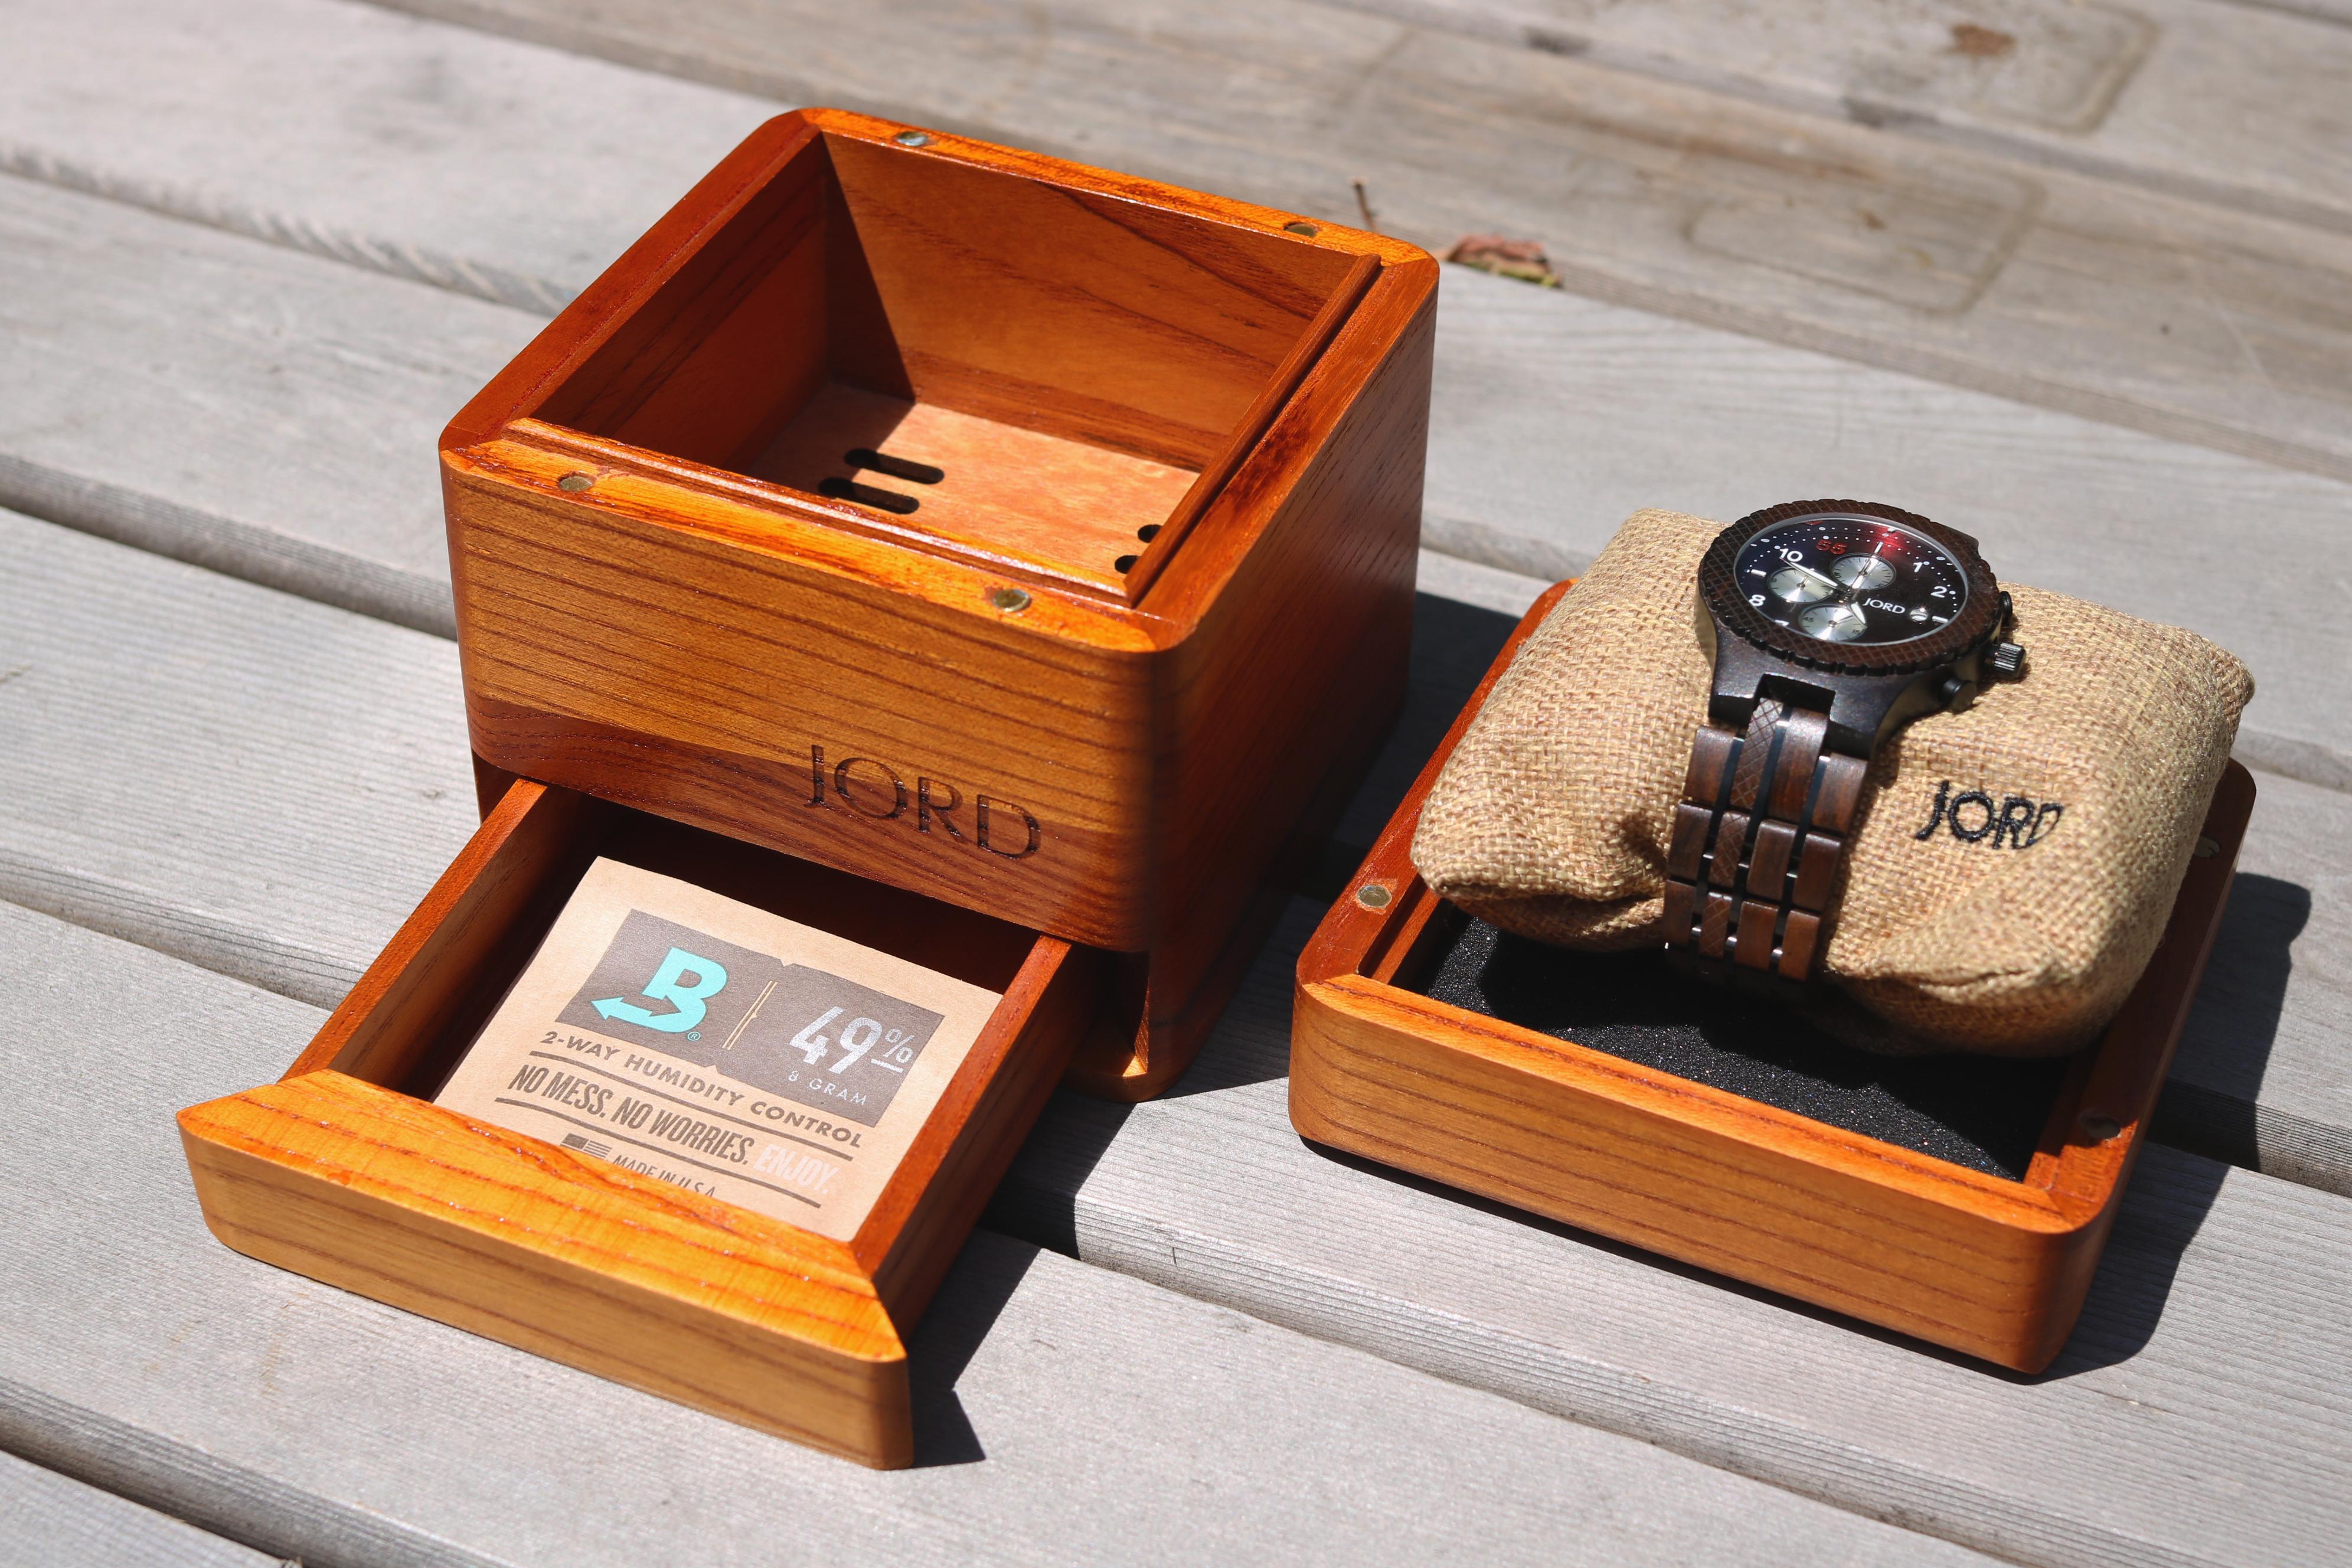 Jord Watch Case